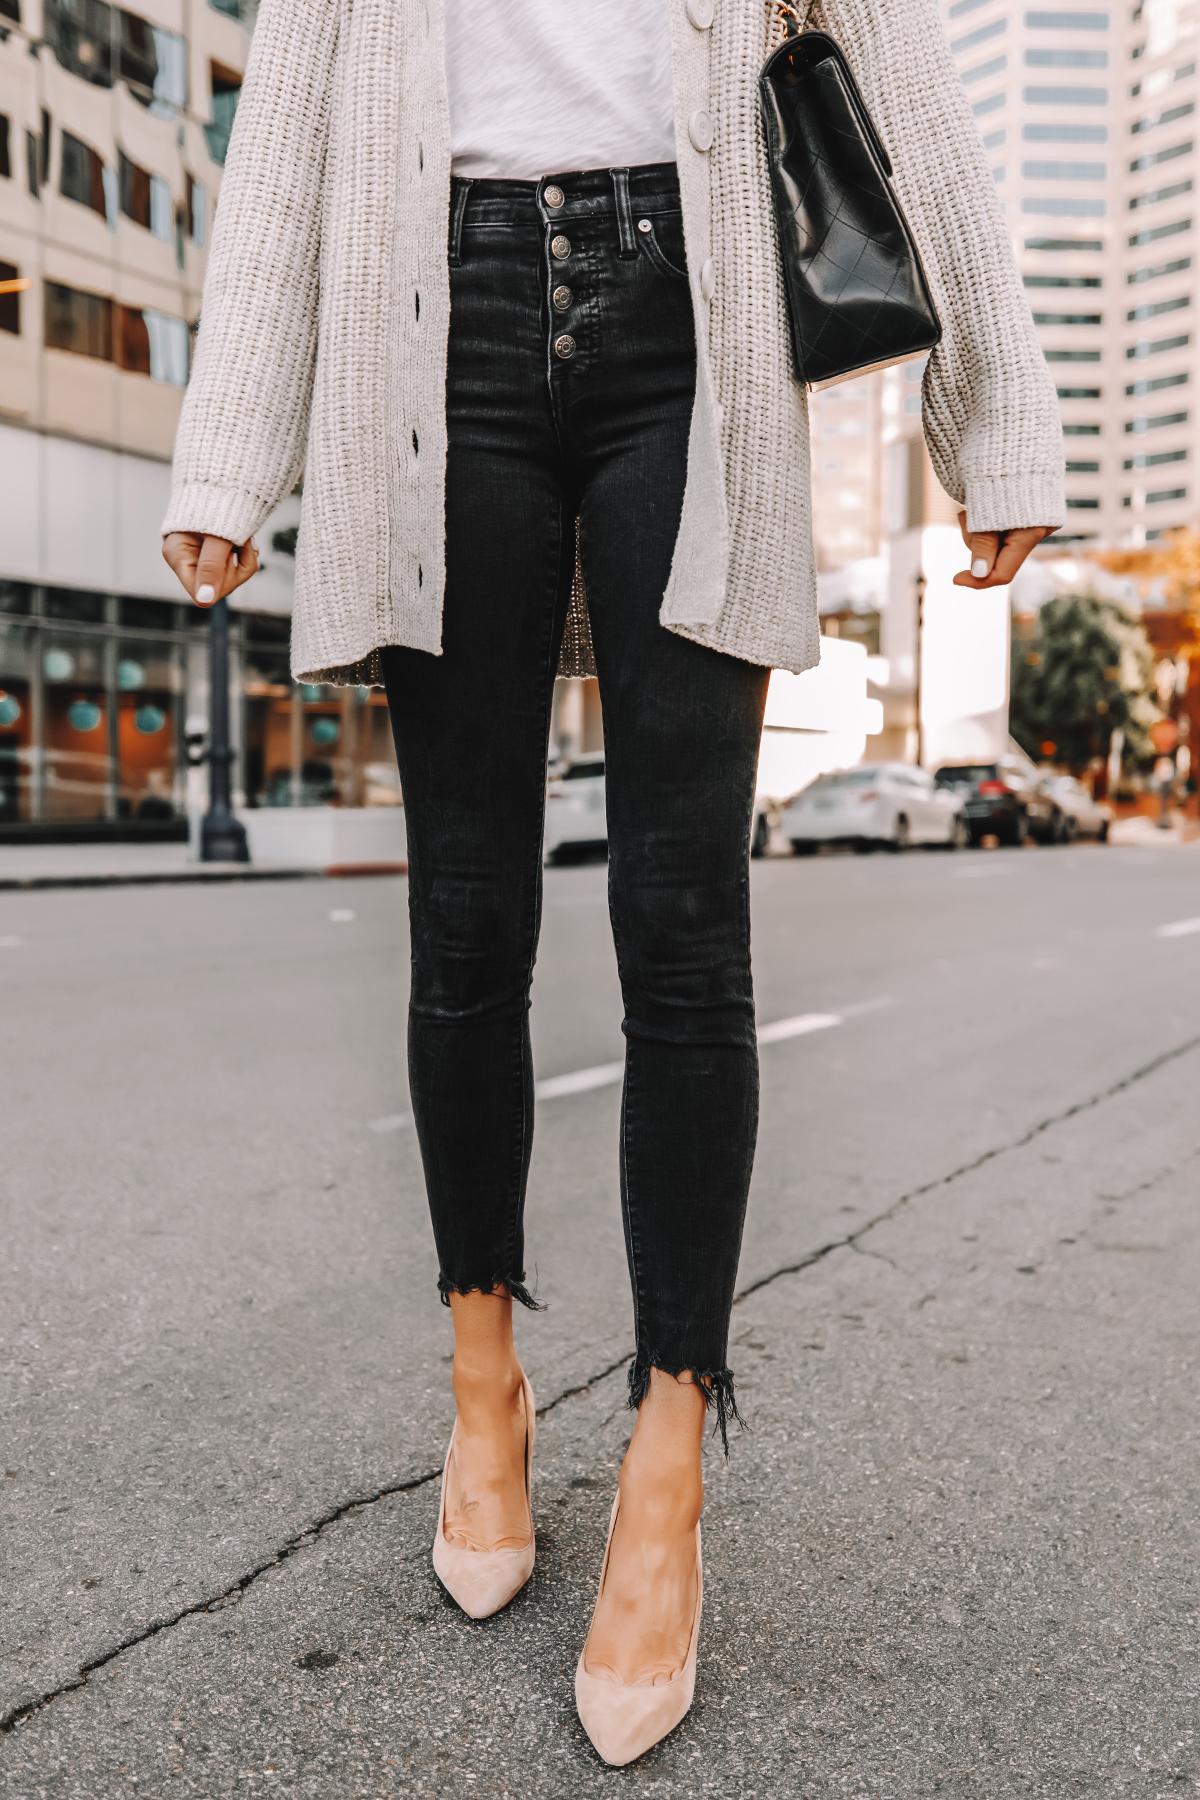 Fashion Jackson Wearing Oversized Cardigan White Tshirt Black Skinny Jeans Nude Pumps